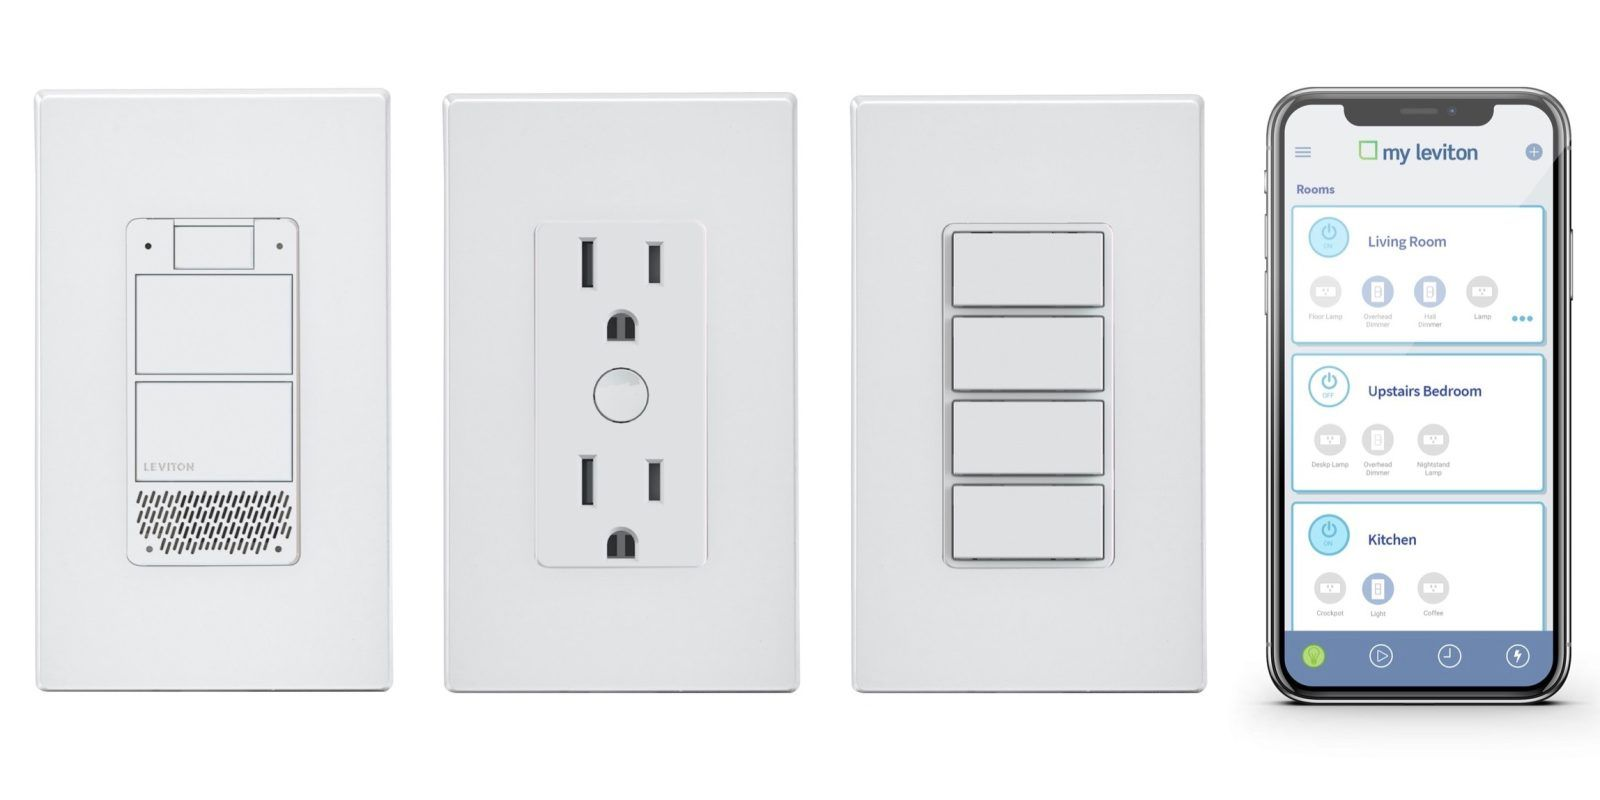 Leviton shows off Decora Voice smart light switch with built